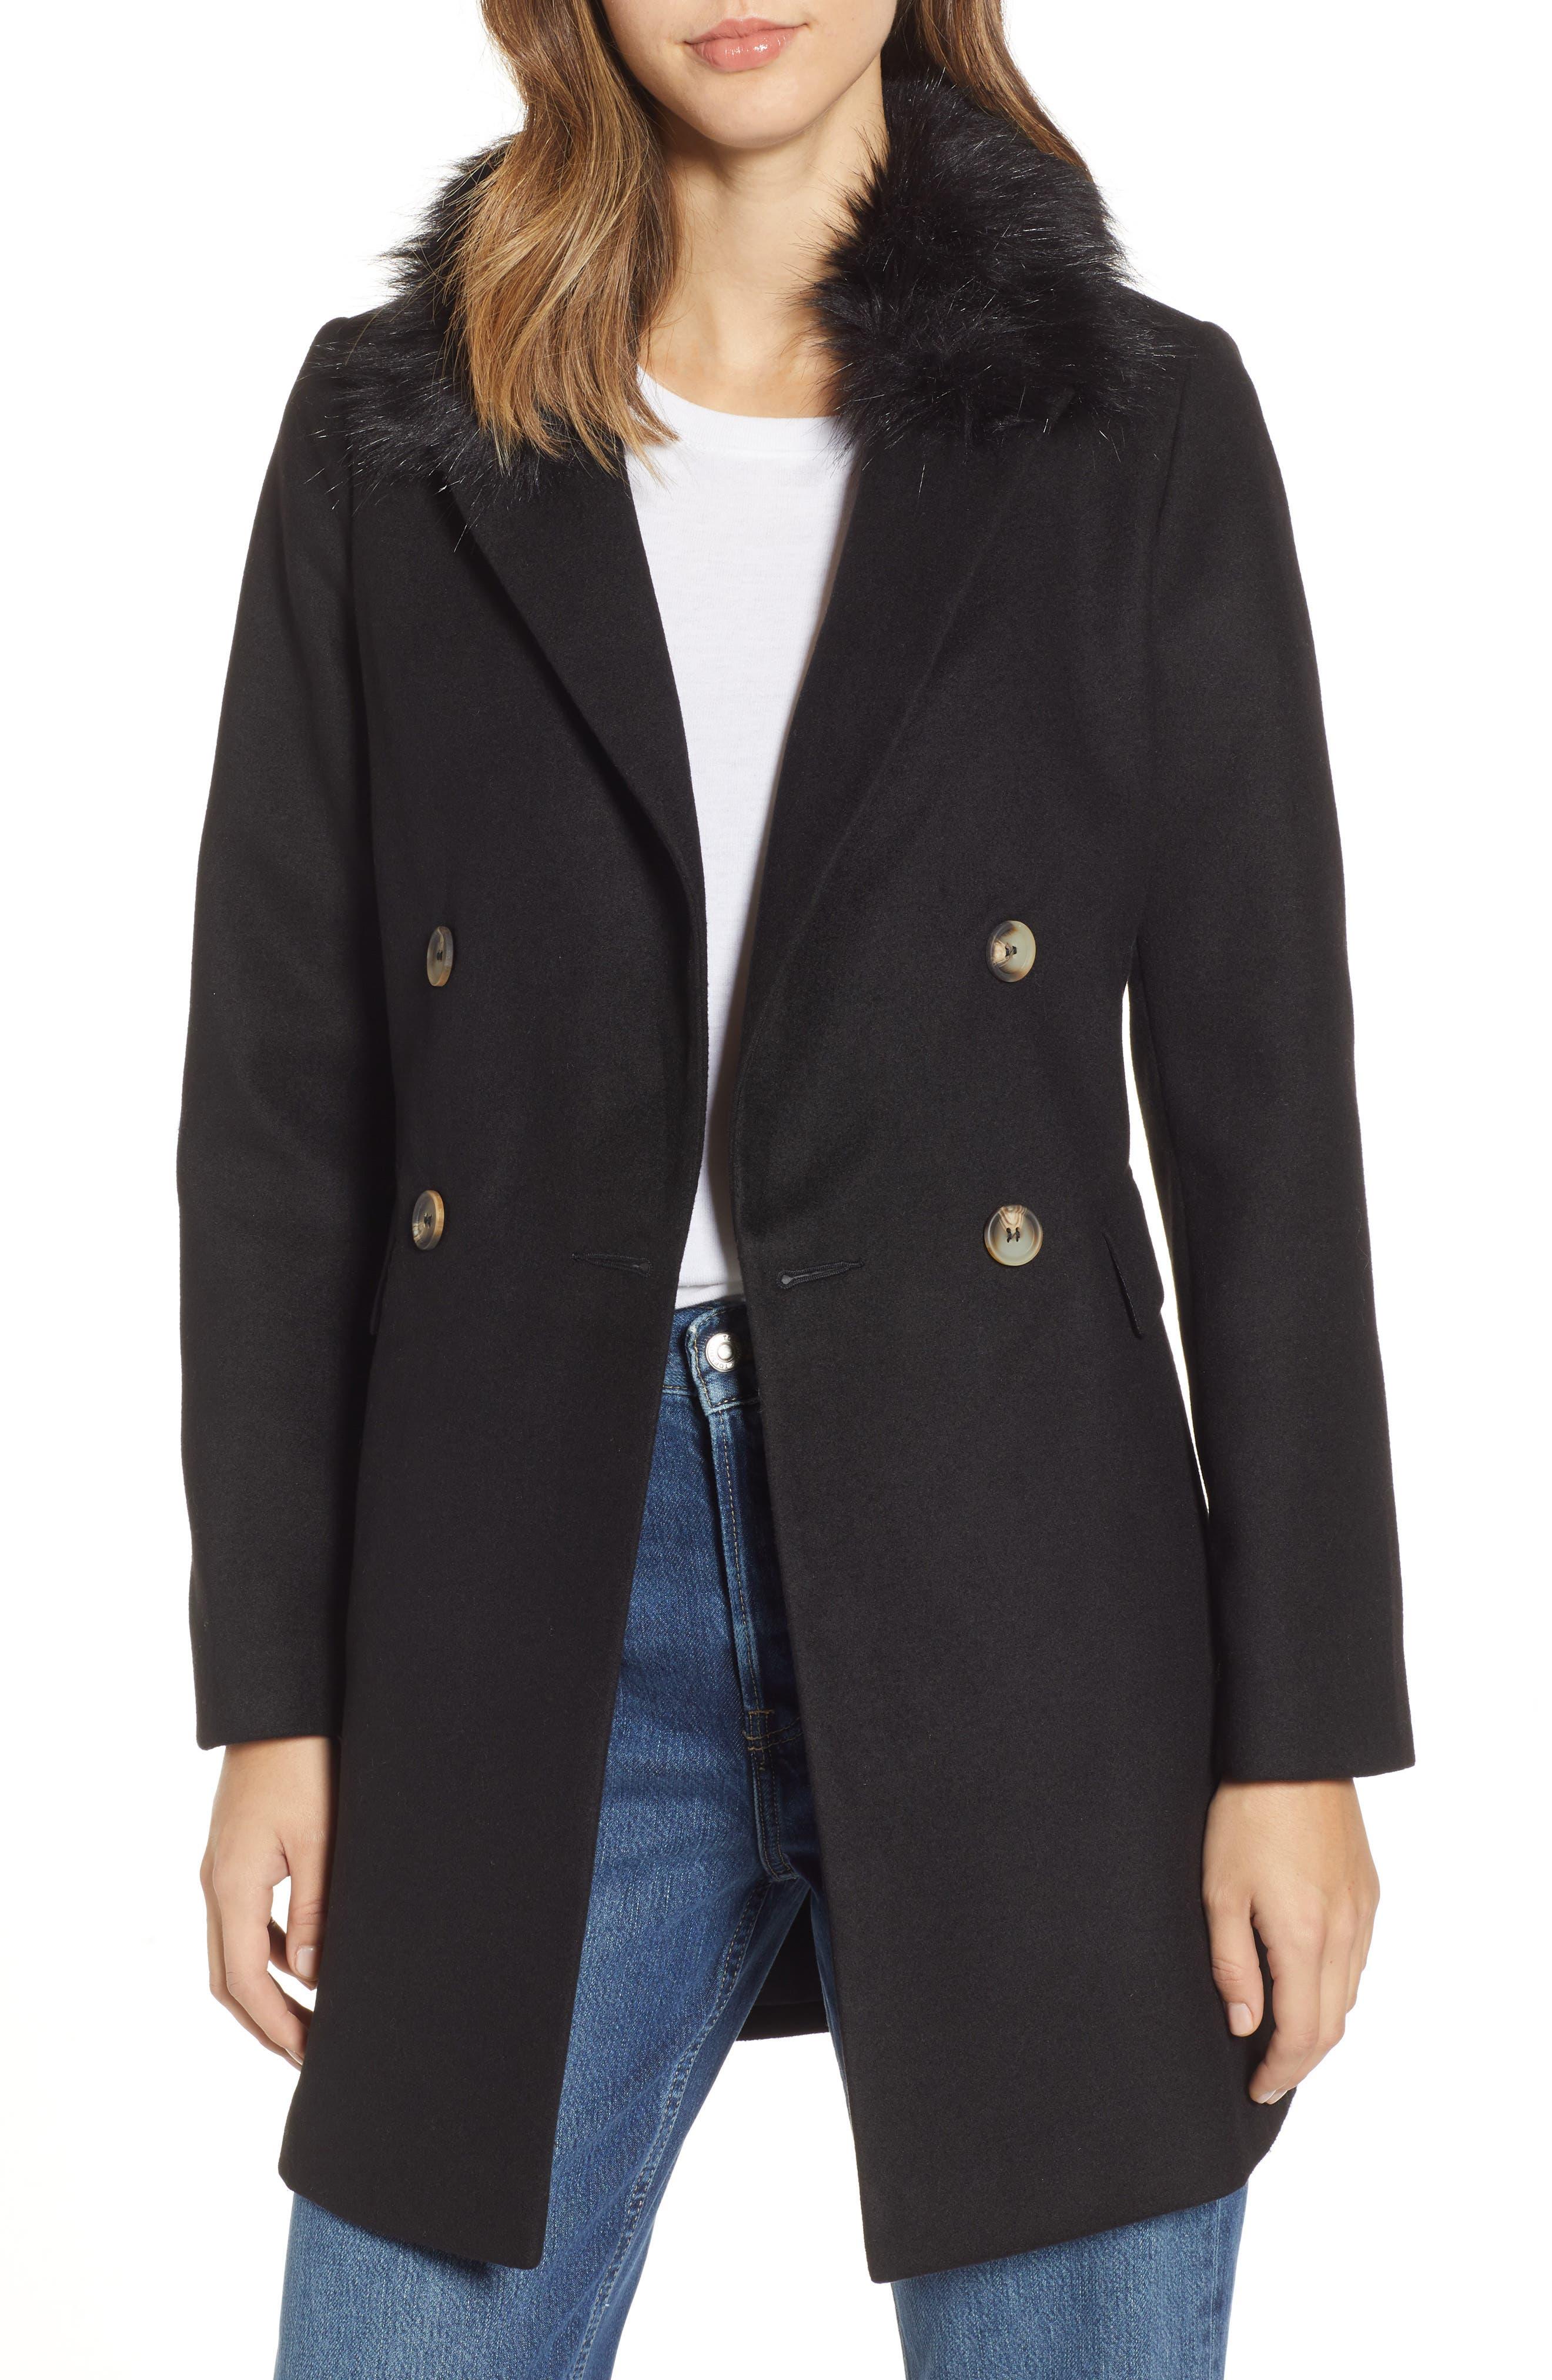 Naomi Faux Fur Collar Coat,                             Main thumbnail 1, color,                             BLACK